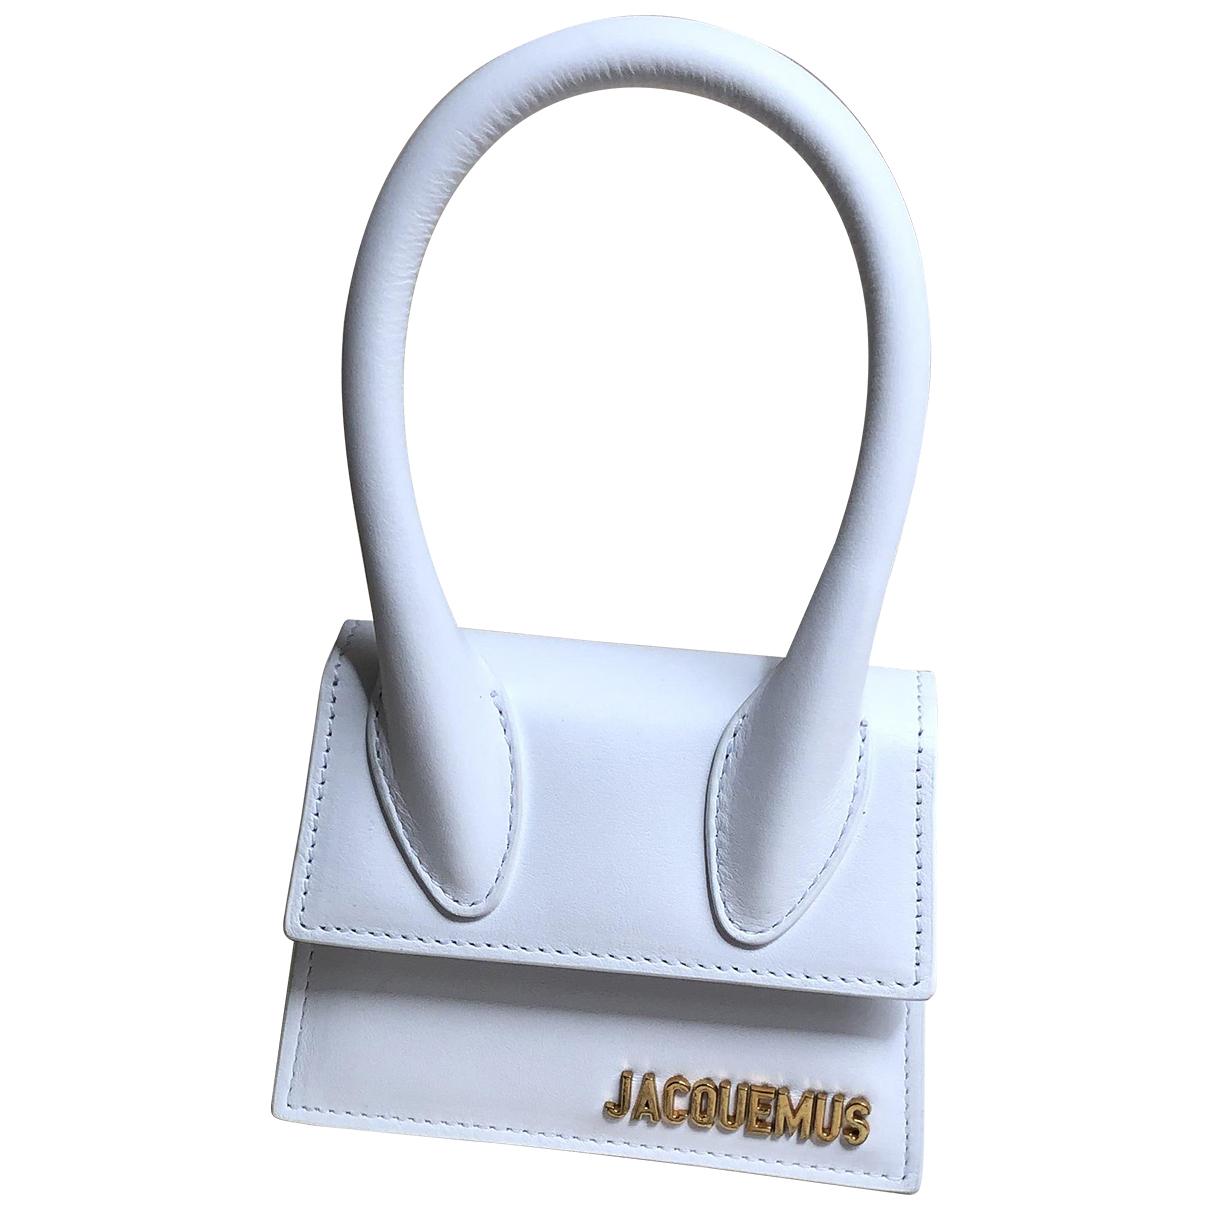 Jacquemus Chiquito Handtasche in  Weiss Leder